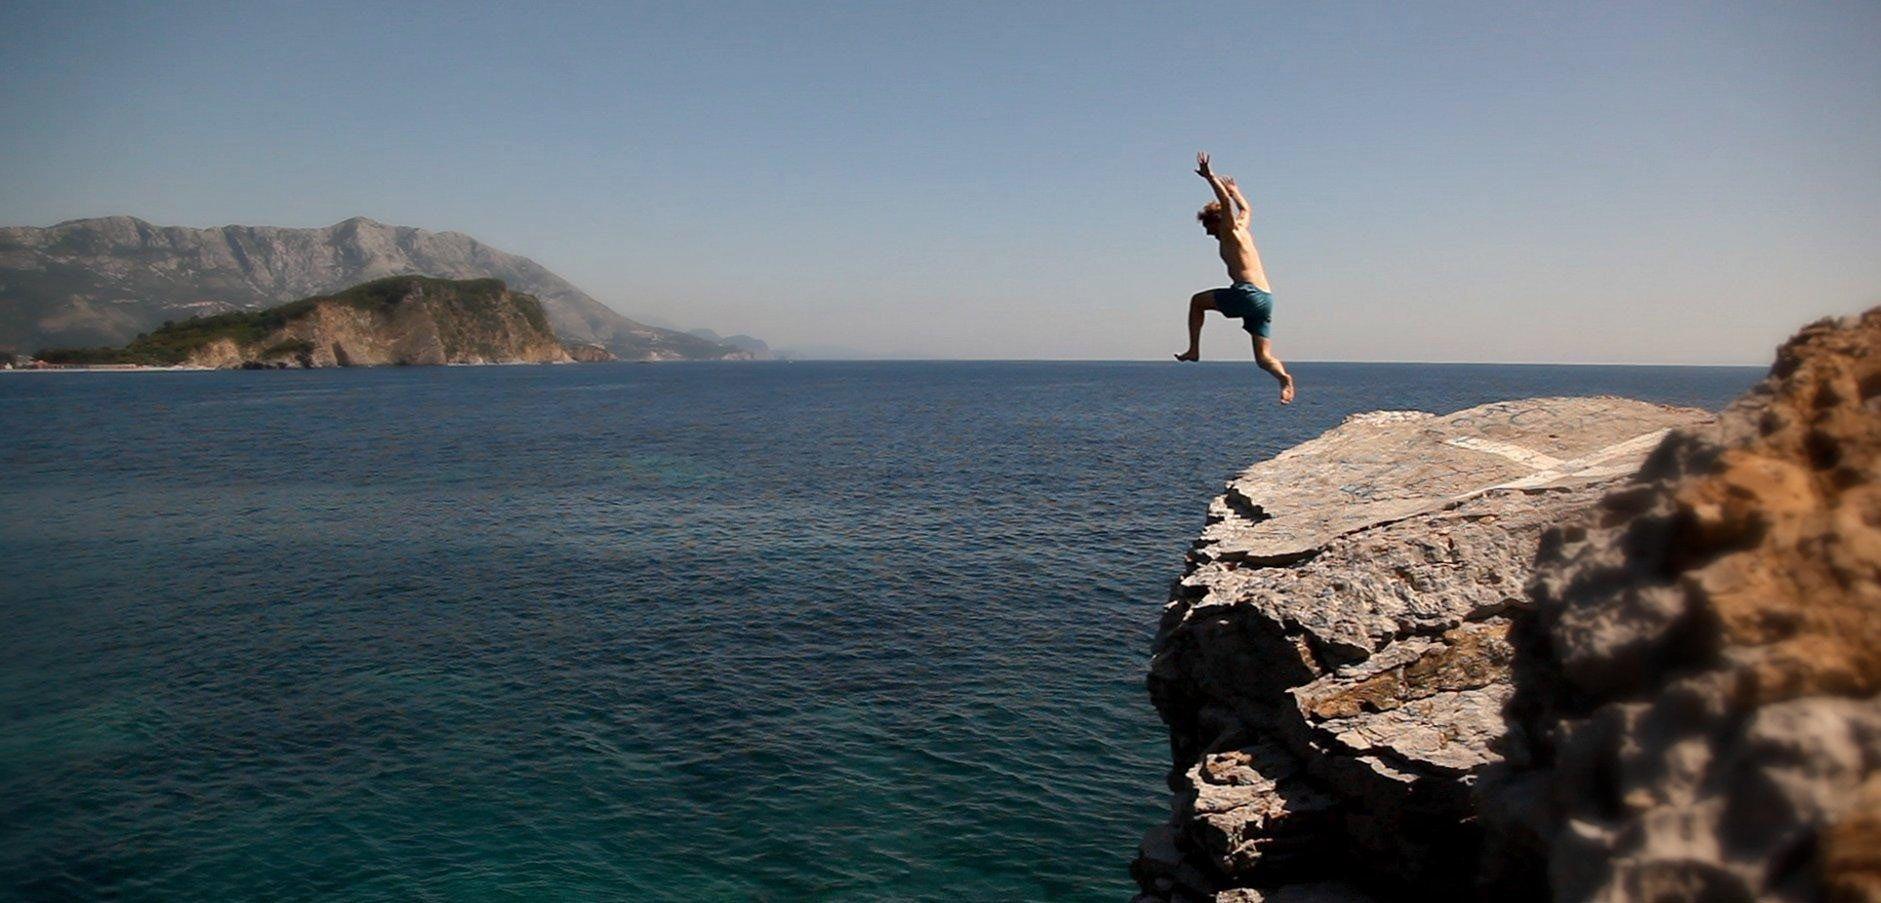 Review: Meet Me in Montenegro - Slant Magazine